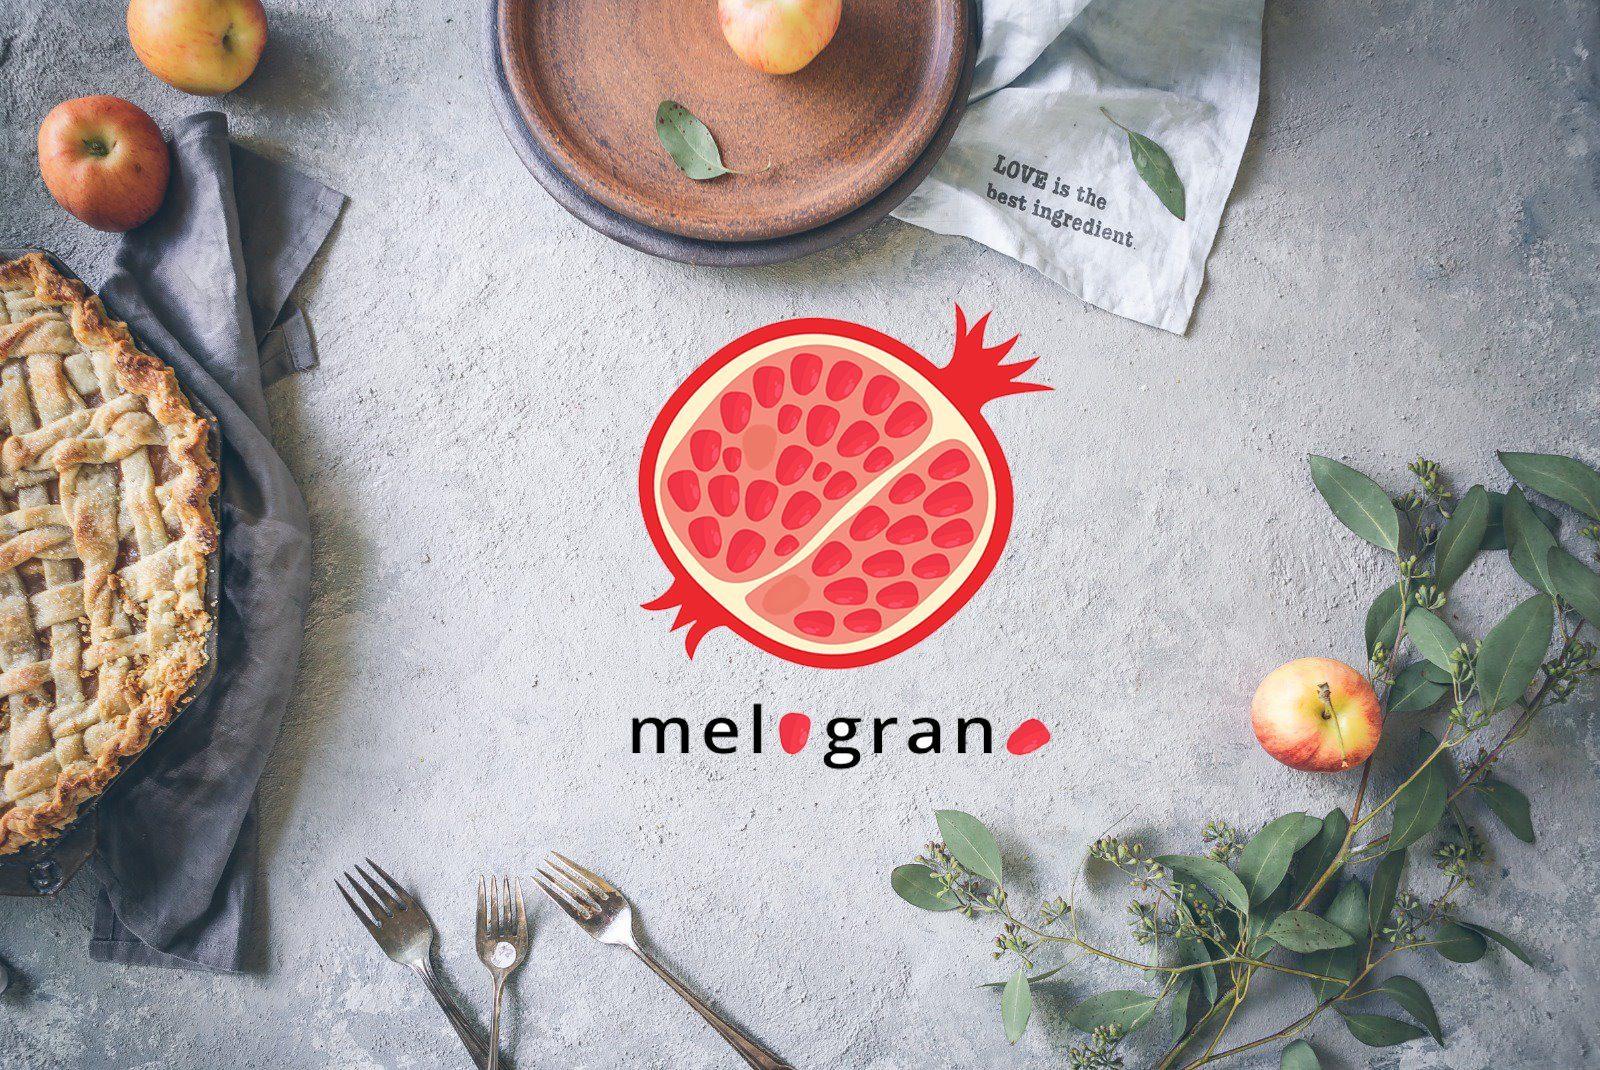 melogranocucina